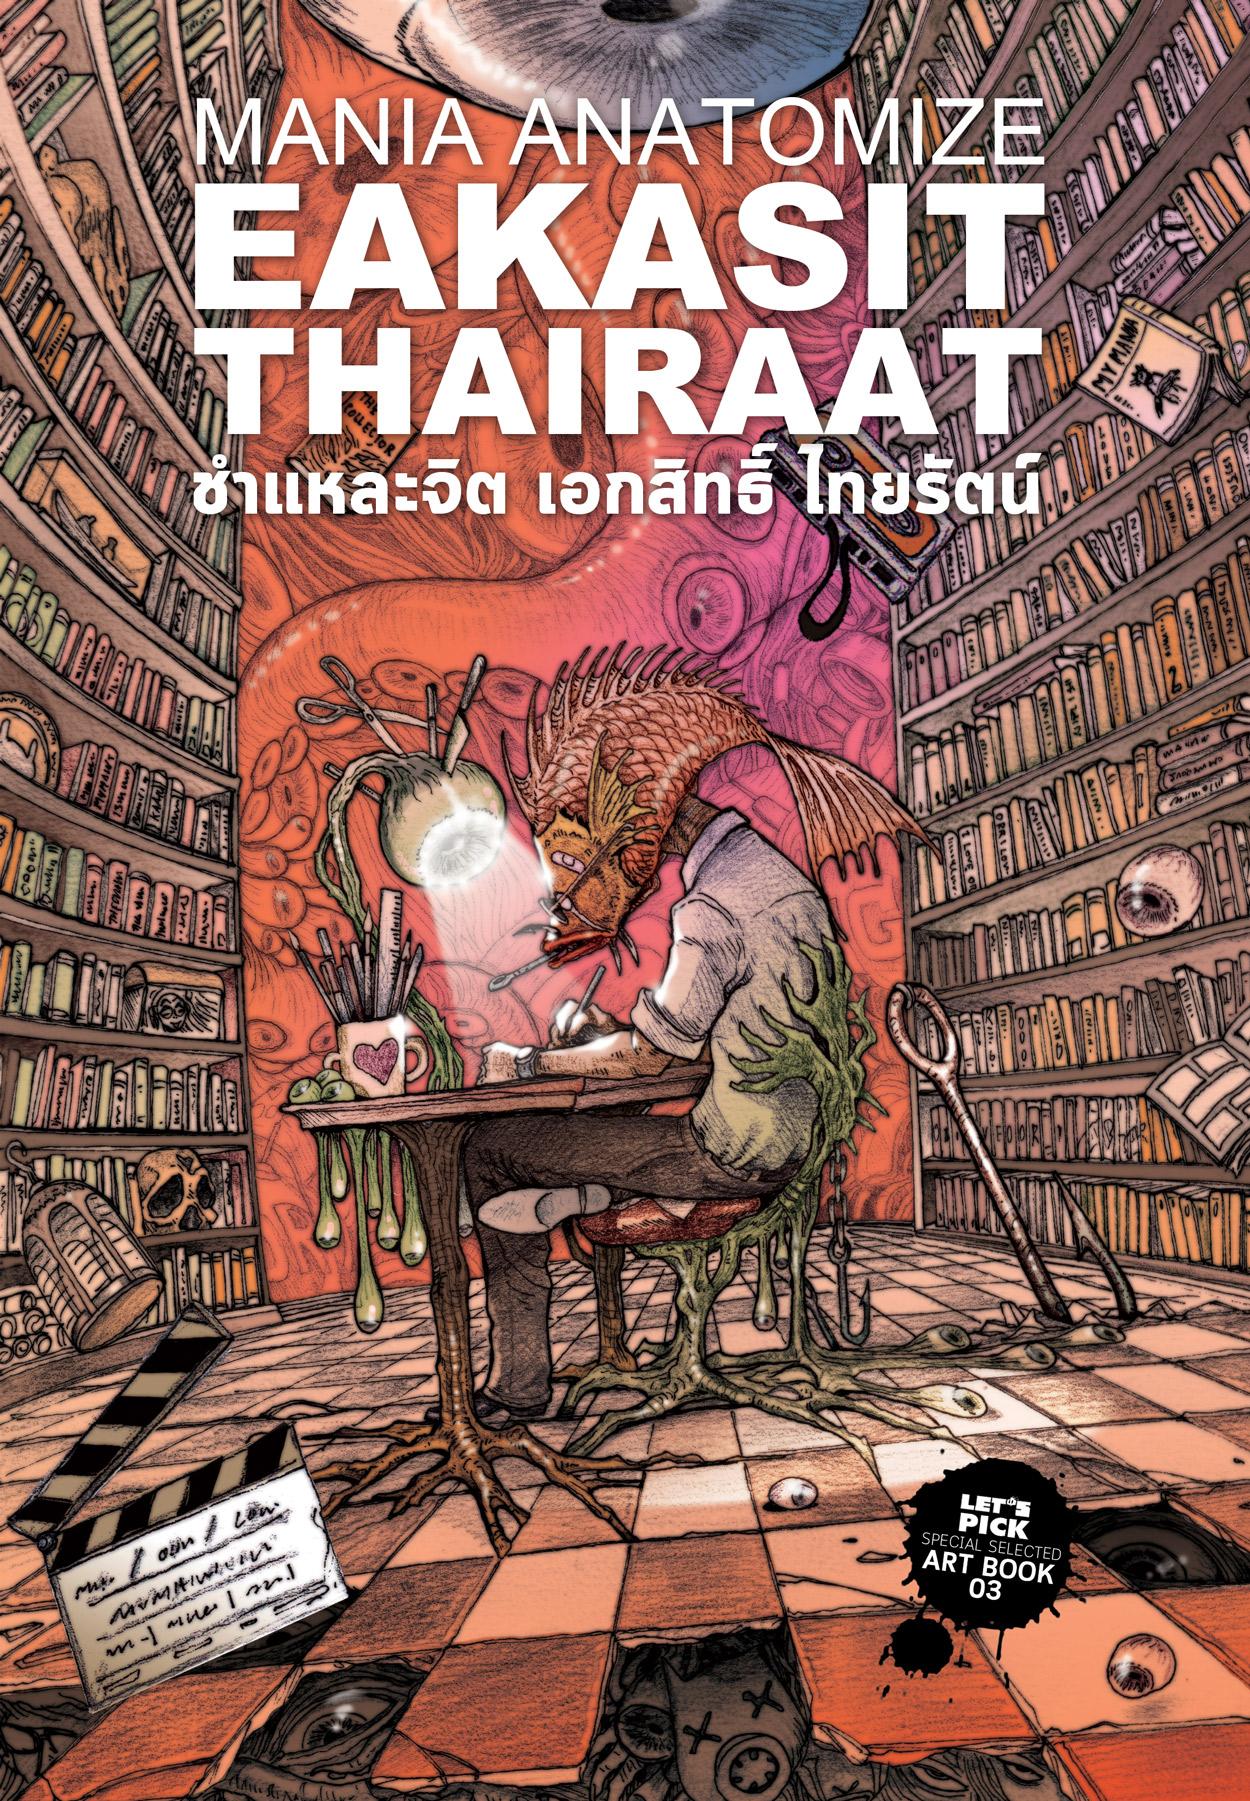 Mania Anatomize - Eakasit Thairaat ชำแหละจิต เอกสิทธิ์ ไทยรัตน์